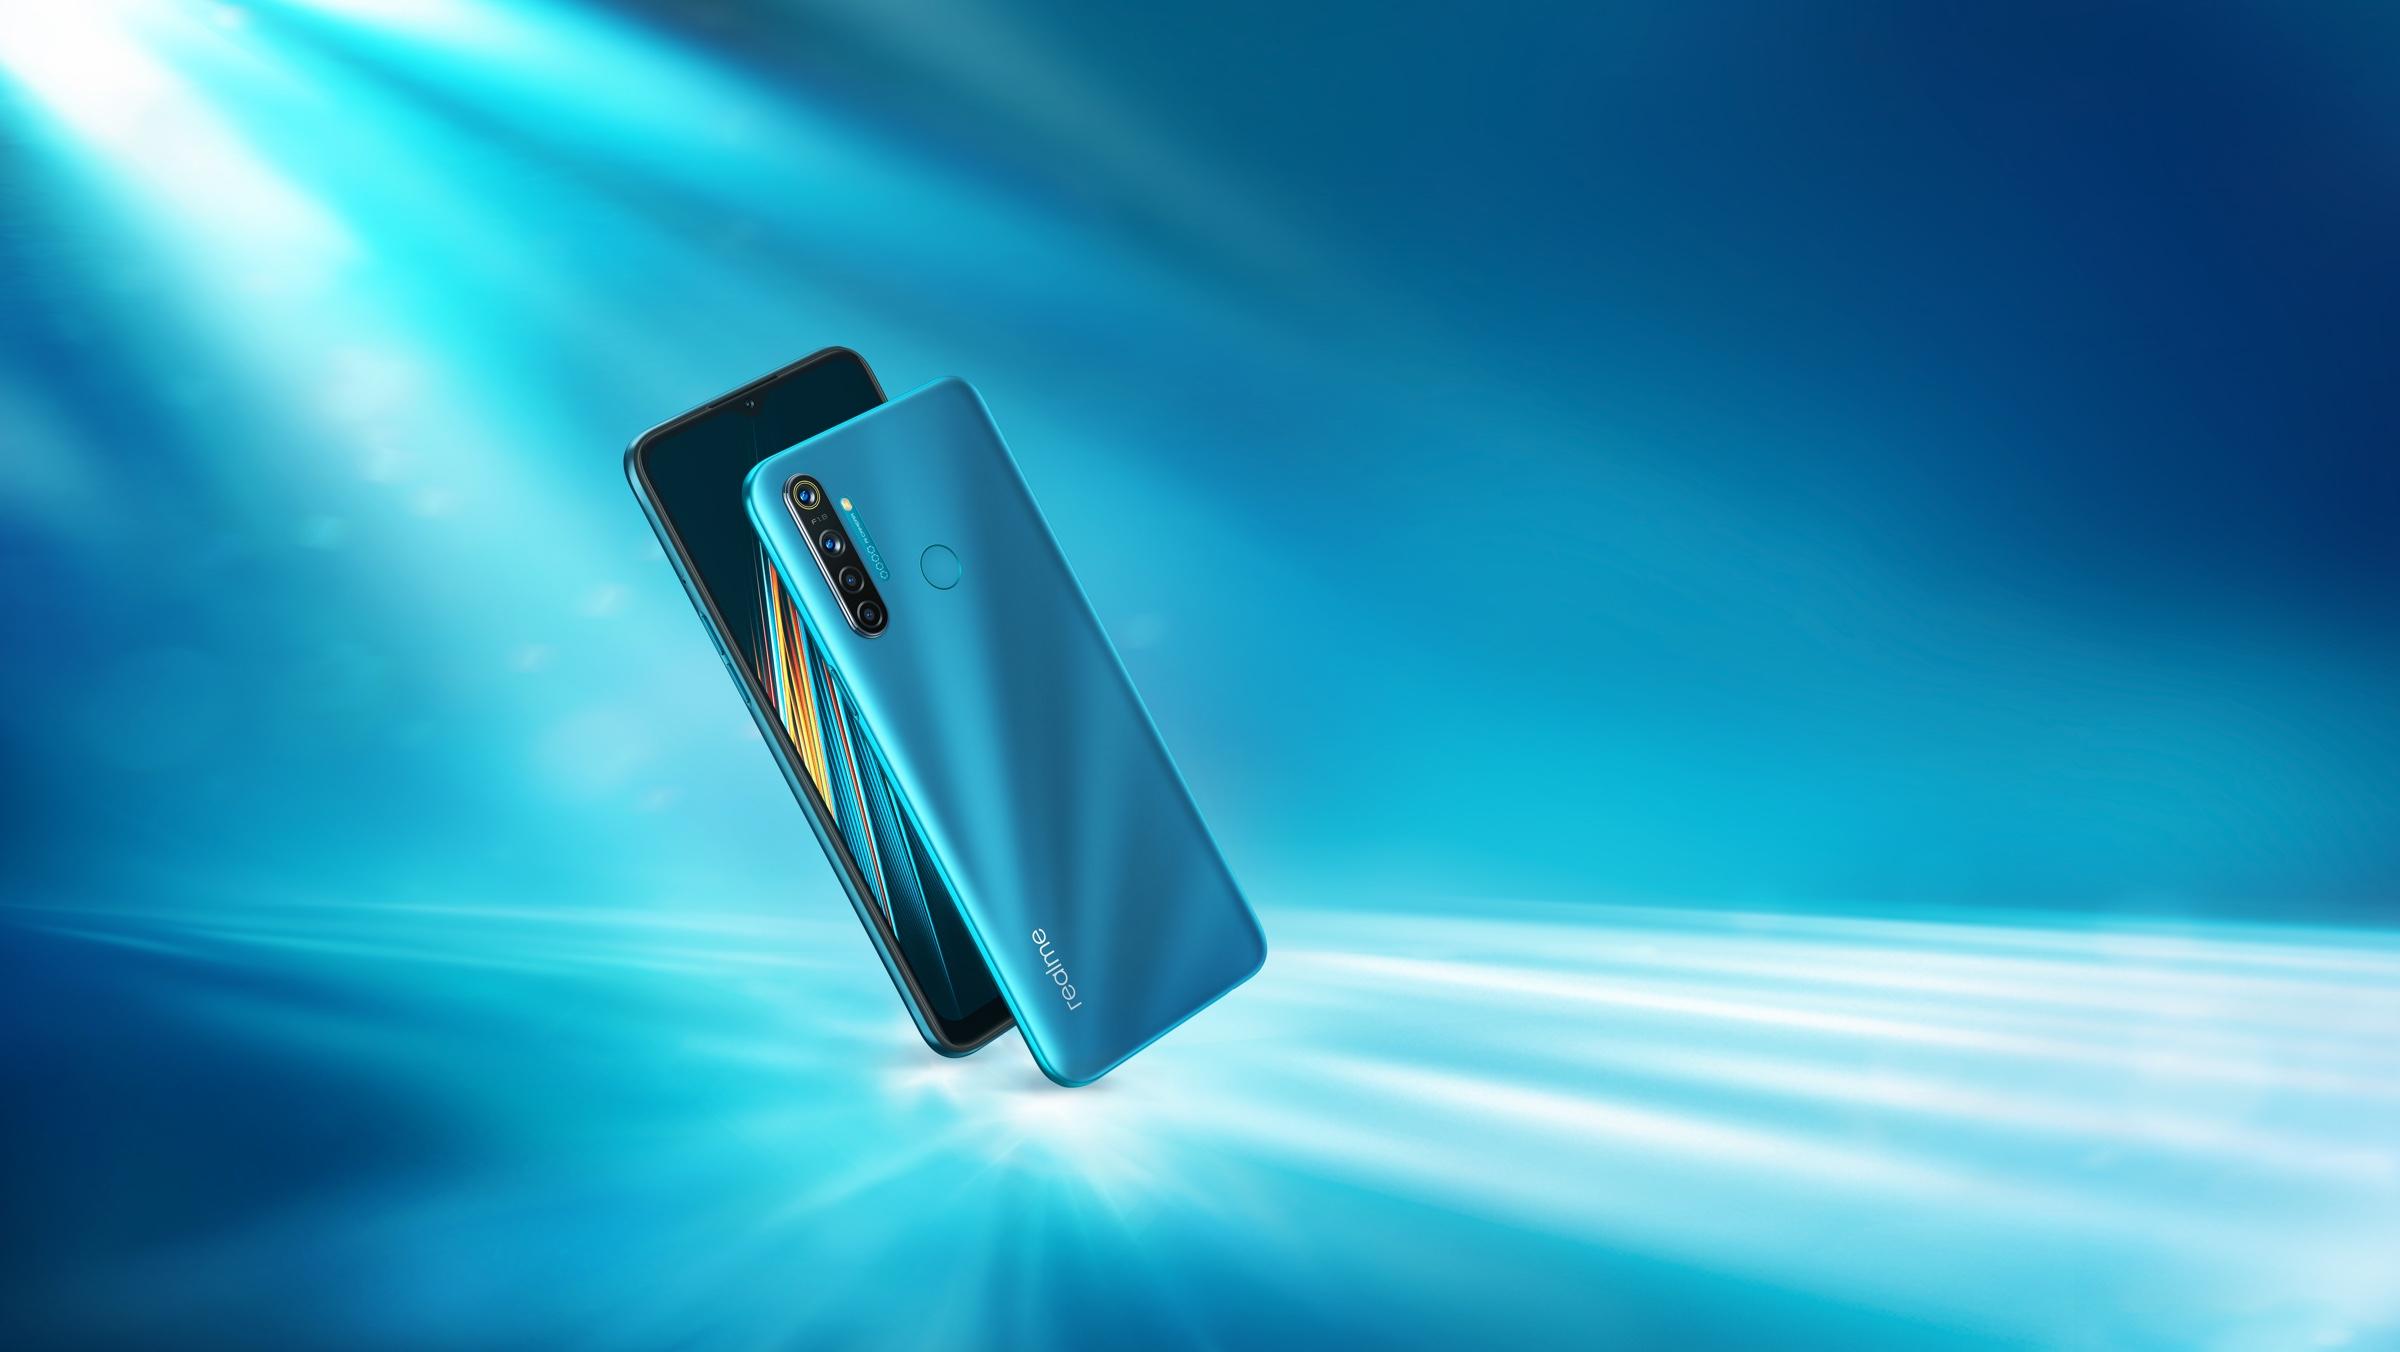 realme-5i-best-budget-phone-2020-photo-2